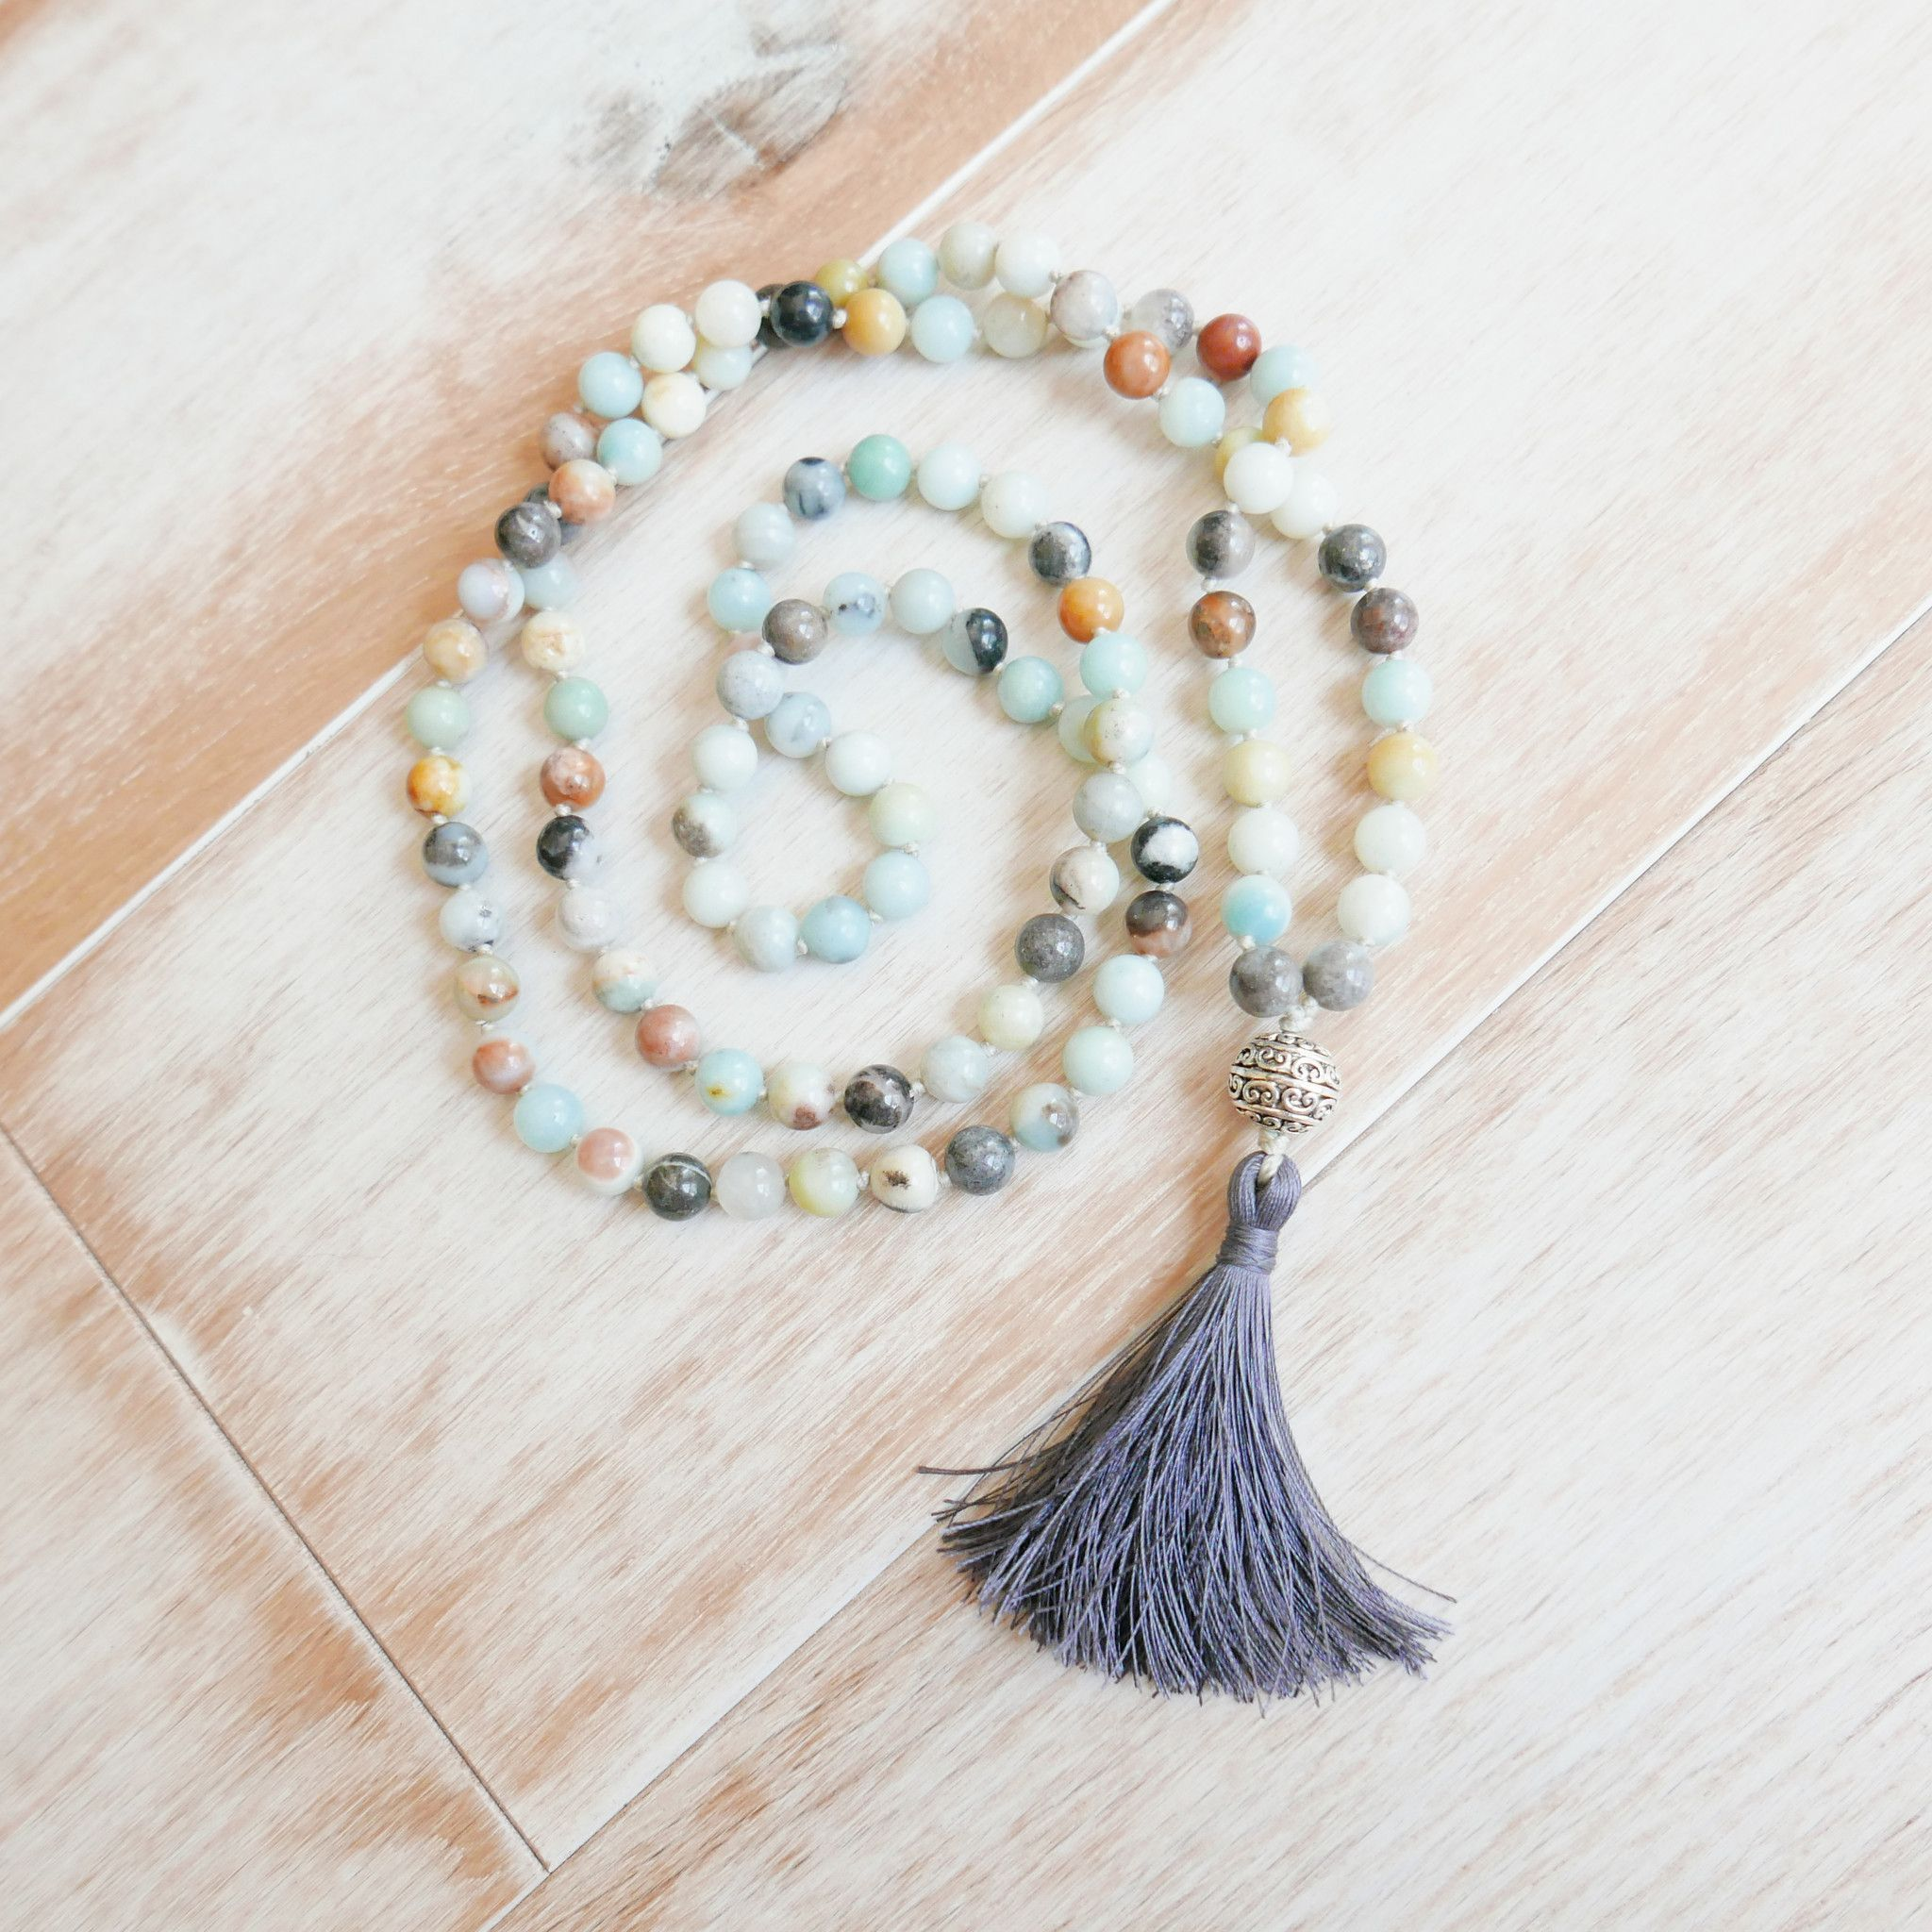 Amazonite Mala Handknotted 108 Mala Bead Necklace Beaded